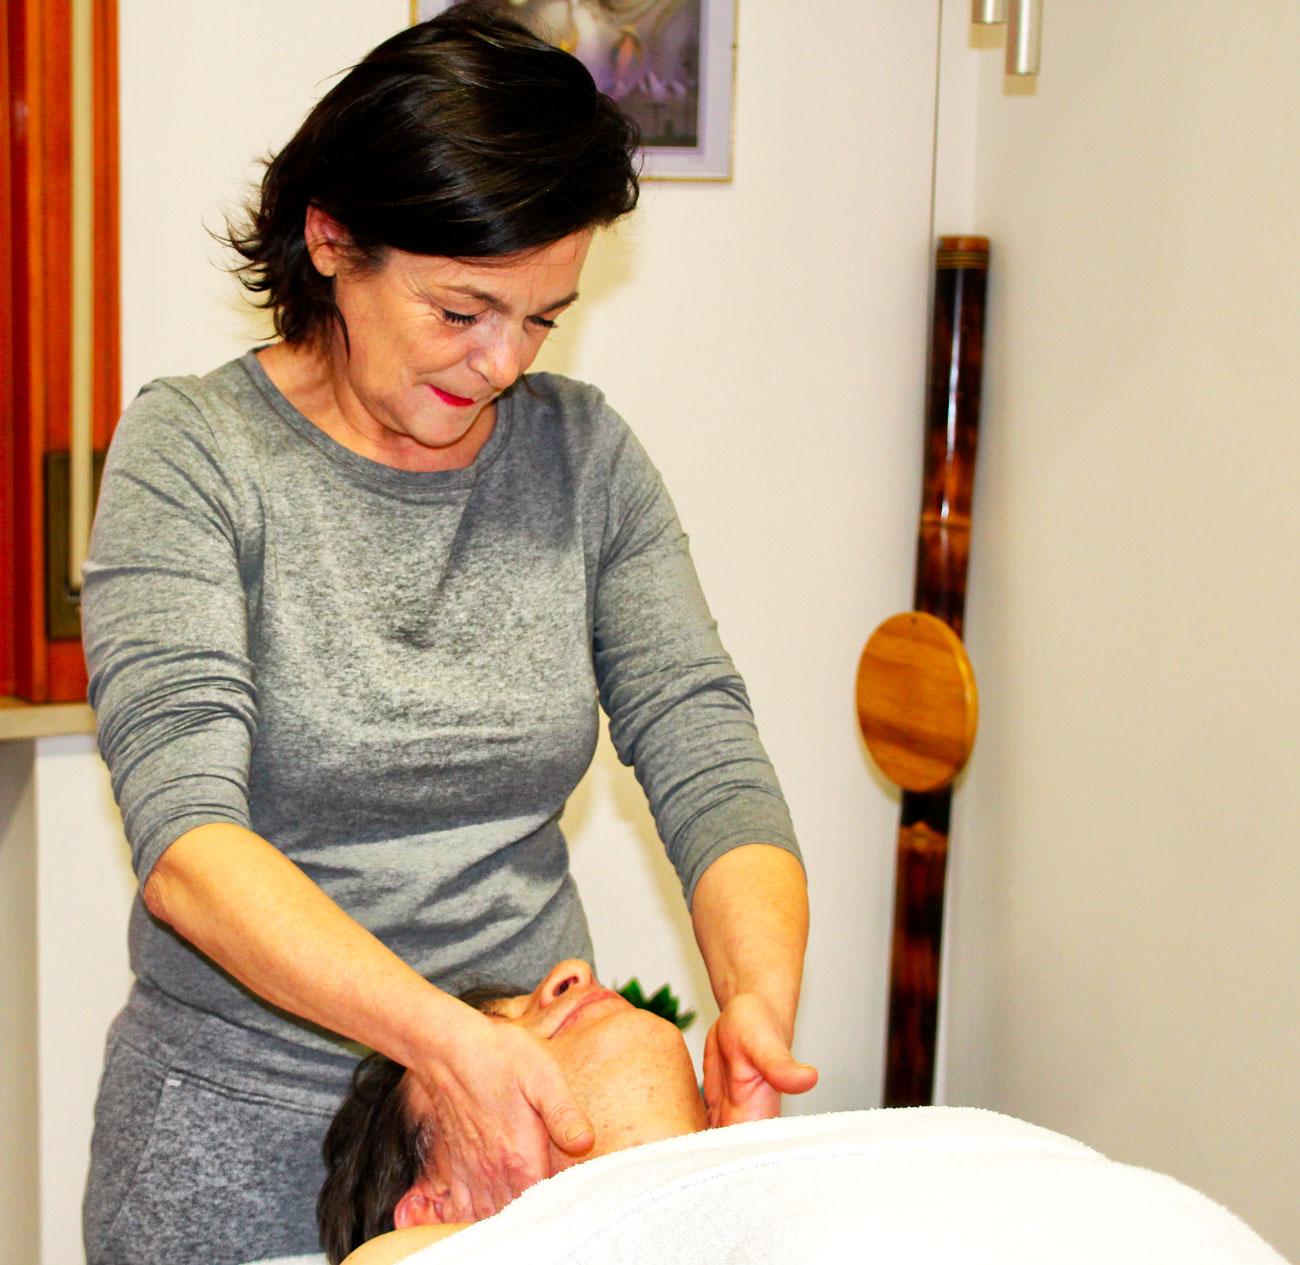 Massaggio-Linfodrenaggio-Vodder-Studio-Gayatri-Monza